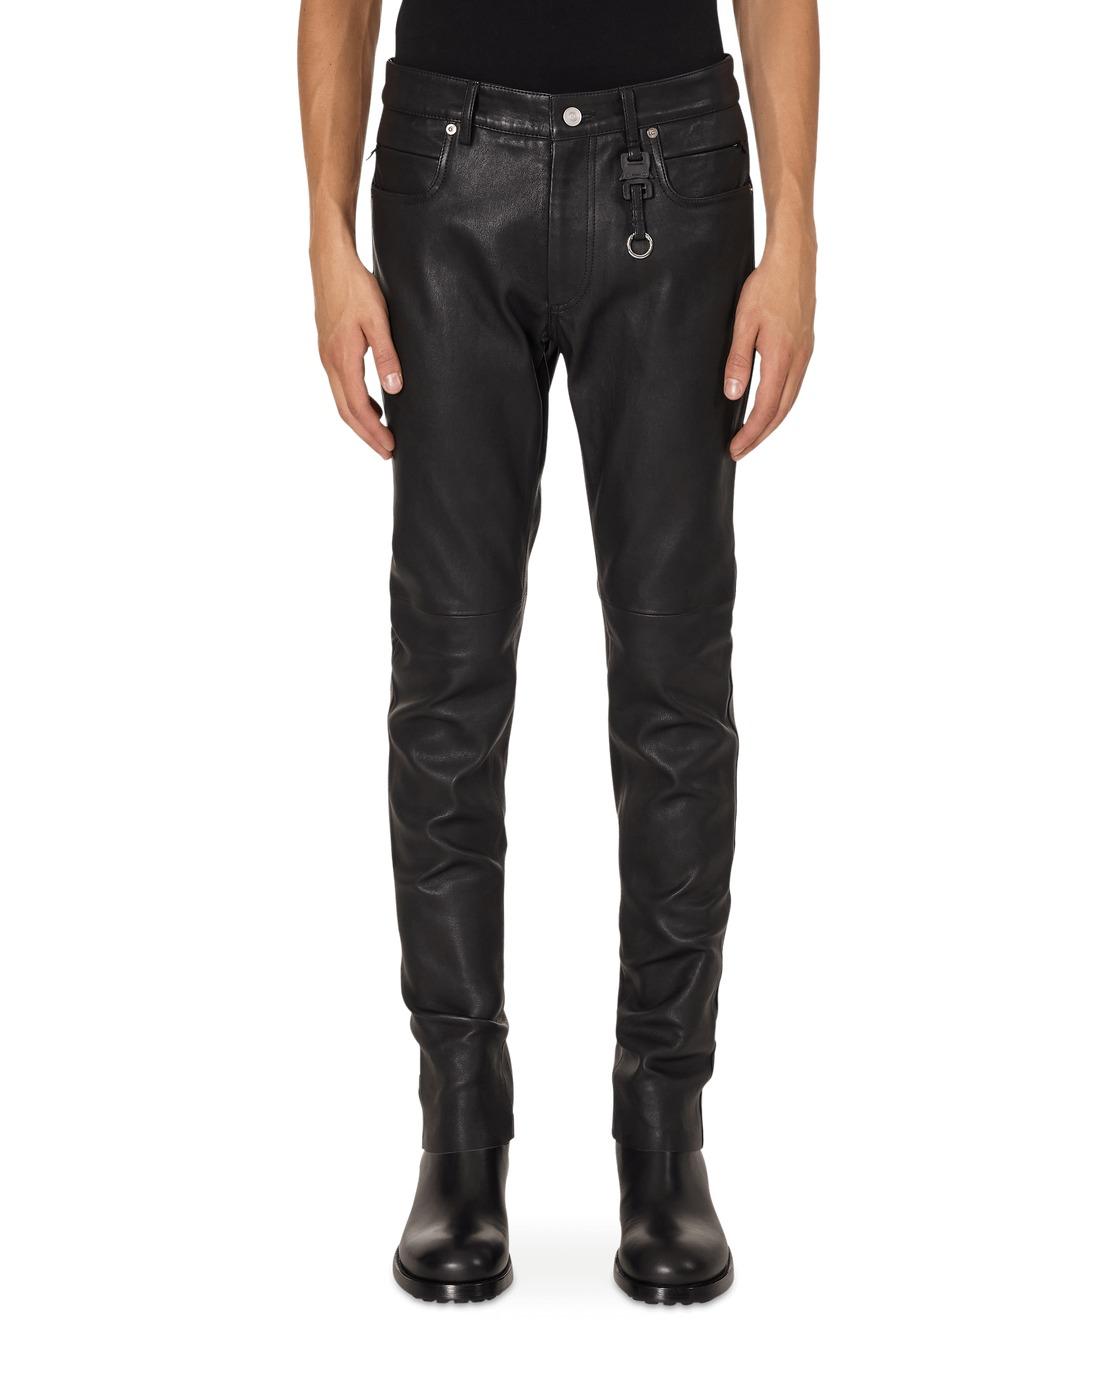 1017 Alyx 9sm Leather 6 Pocket Pants Black